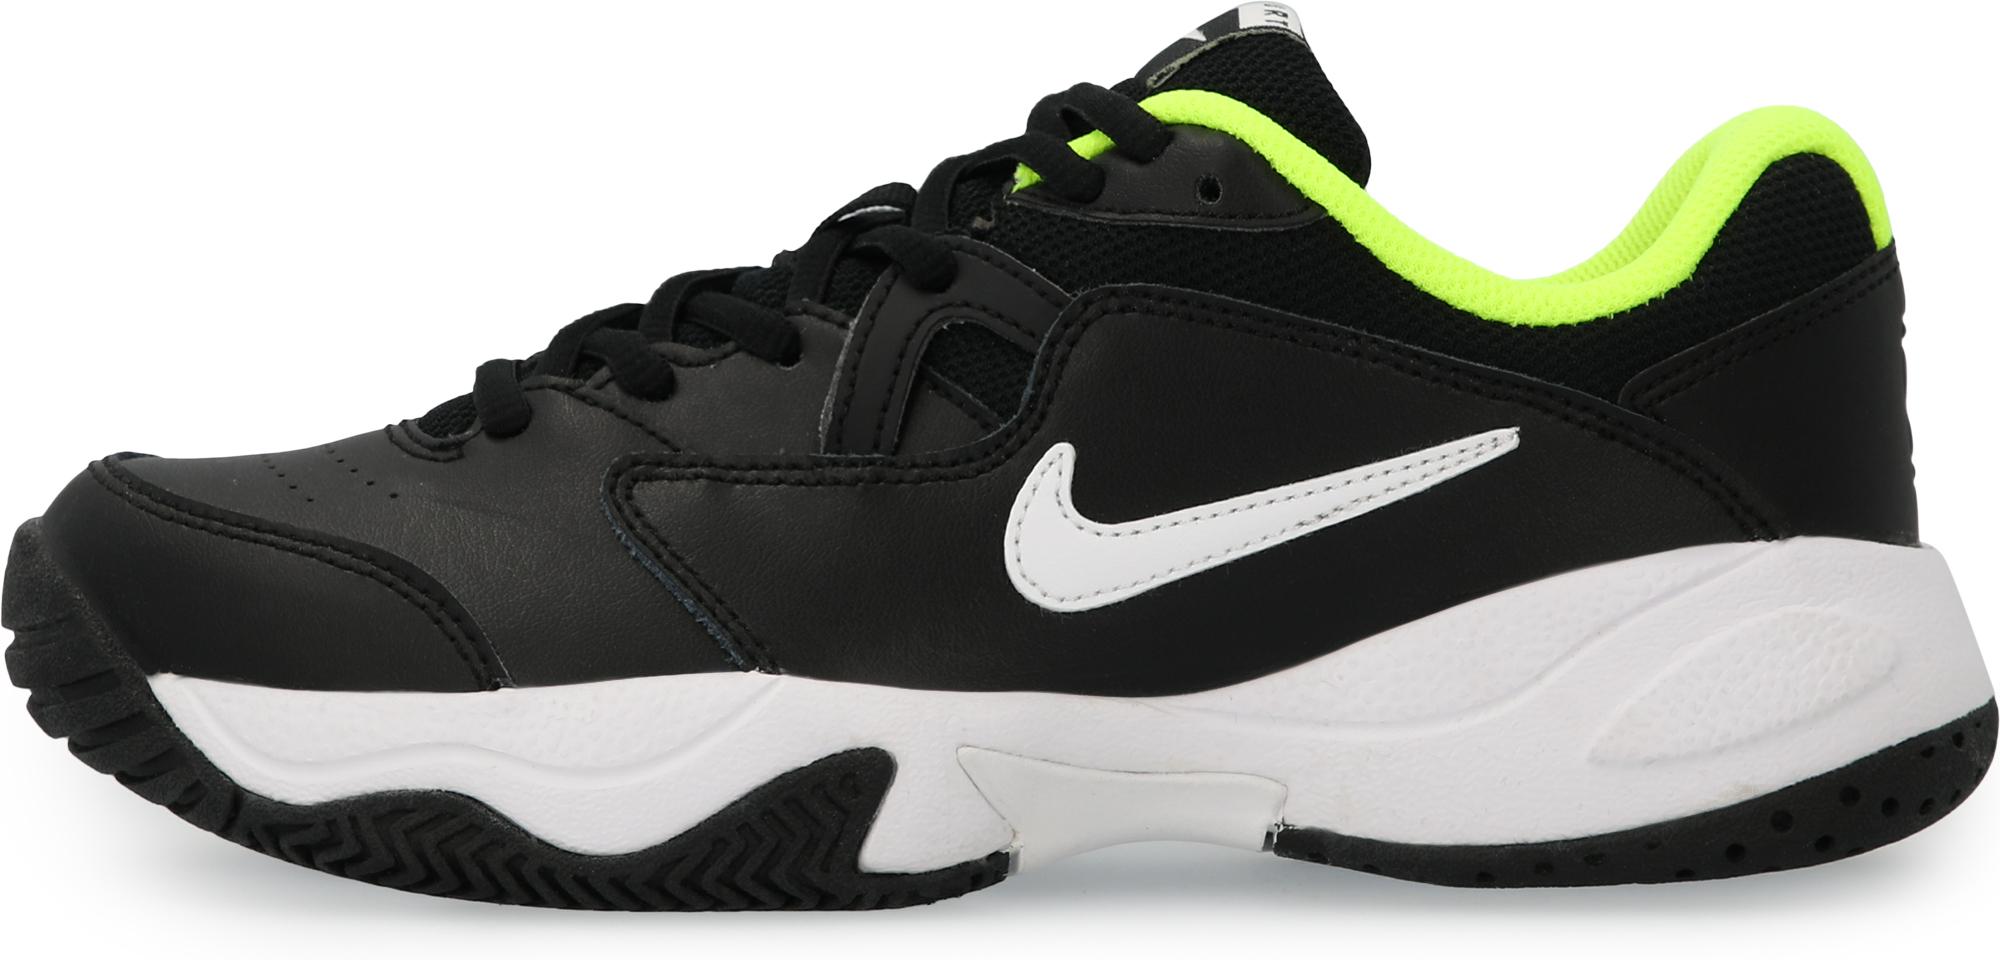 Nike Кроссовки детские Nike Court Lite 2, размер 35.5 кроссовки детские nike цвет синий